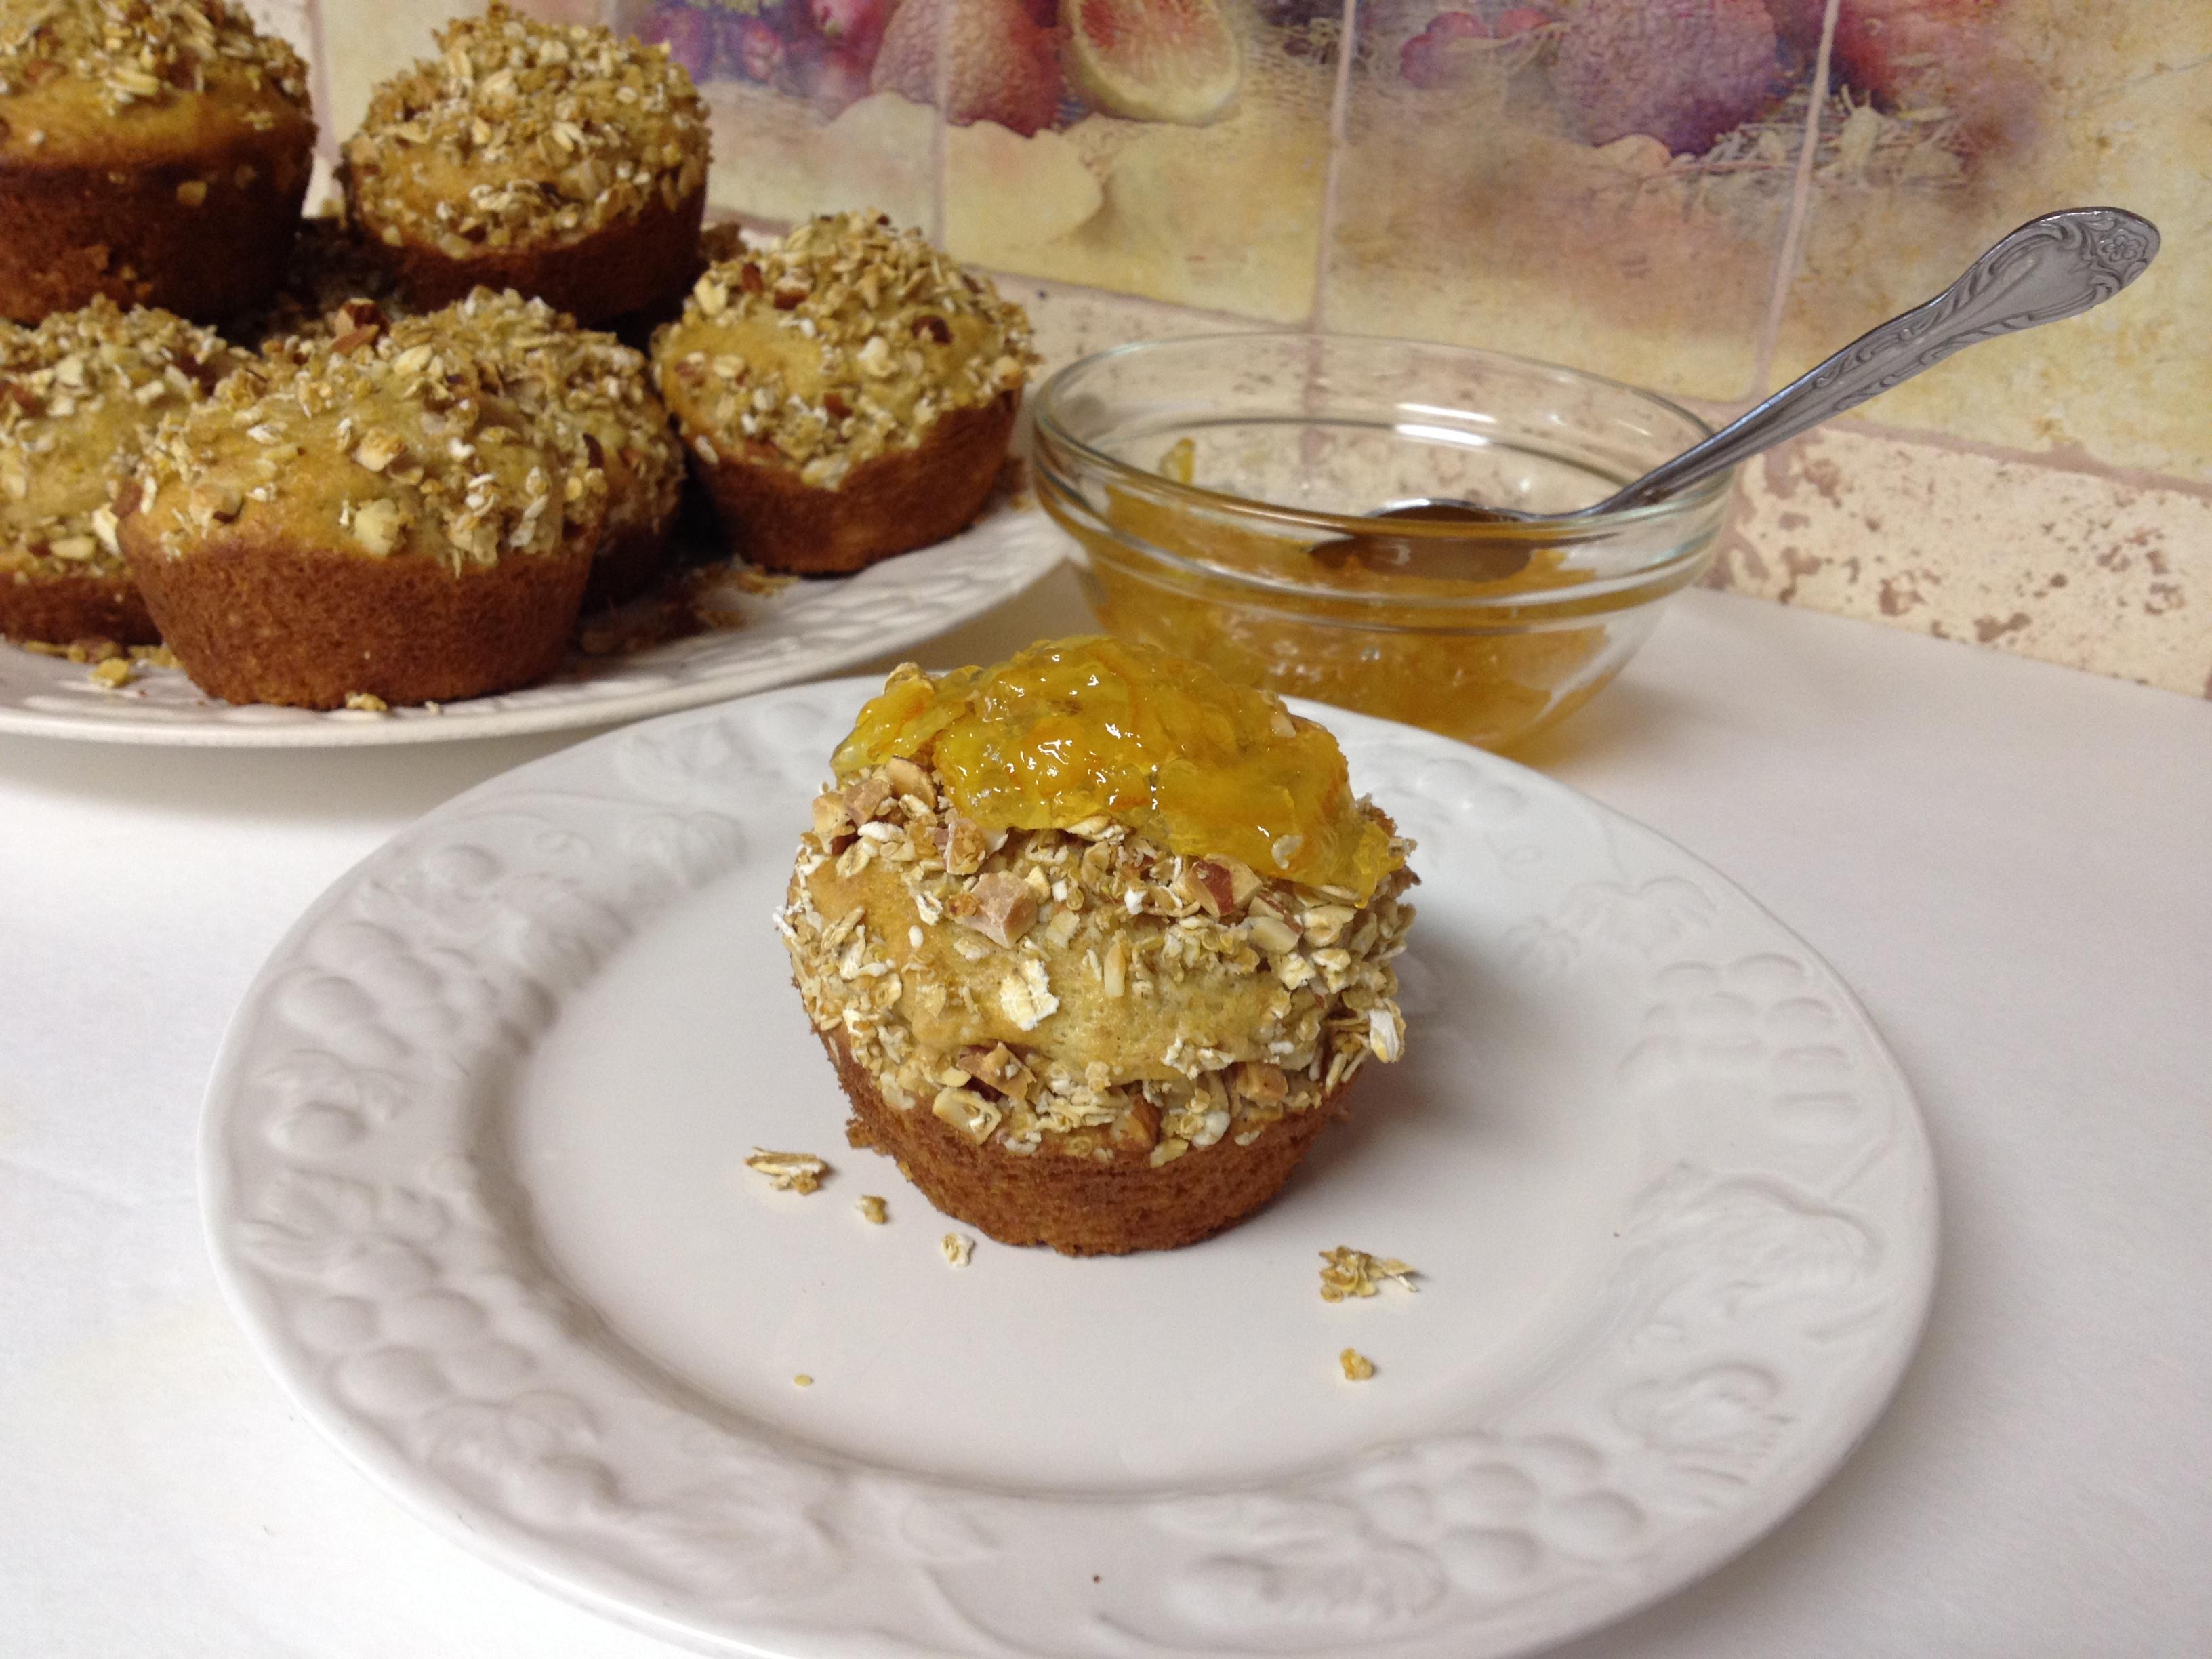 Toasted Whole Grain Orange Muffins Splendid Recipes And More